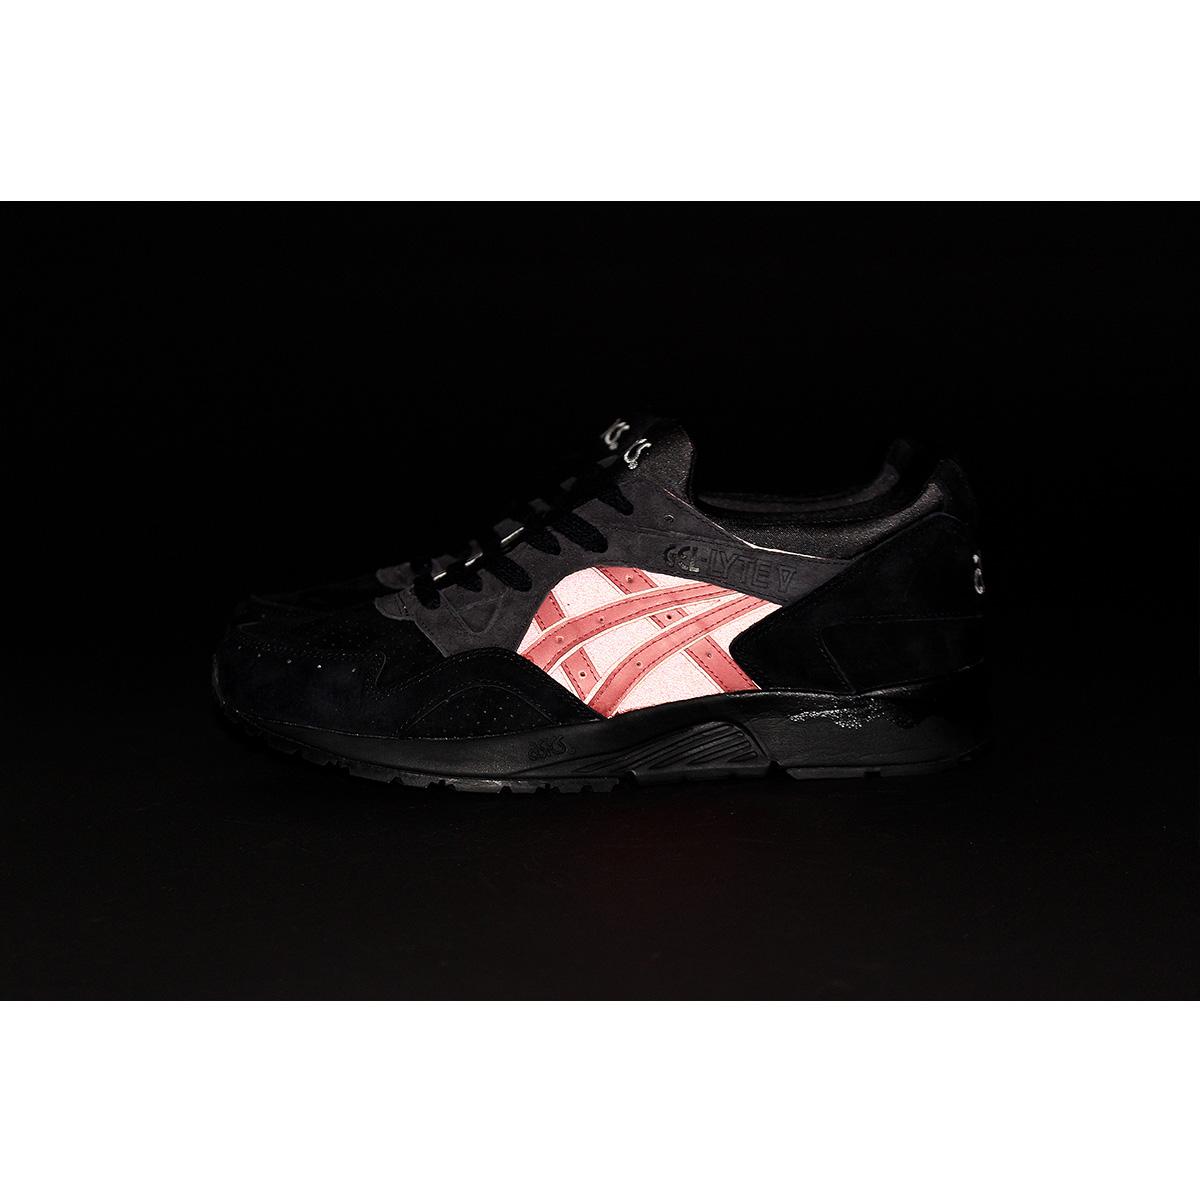 f:id:shoesmaster:20210410223302p:plain